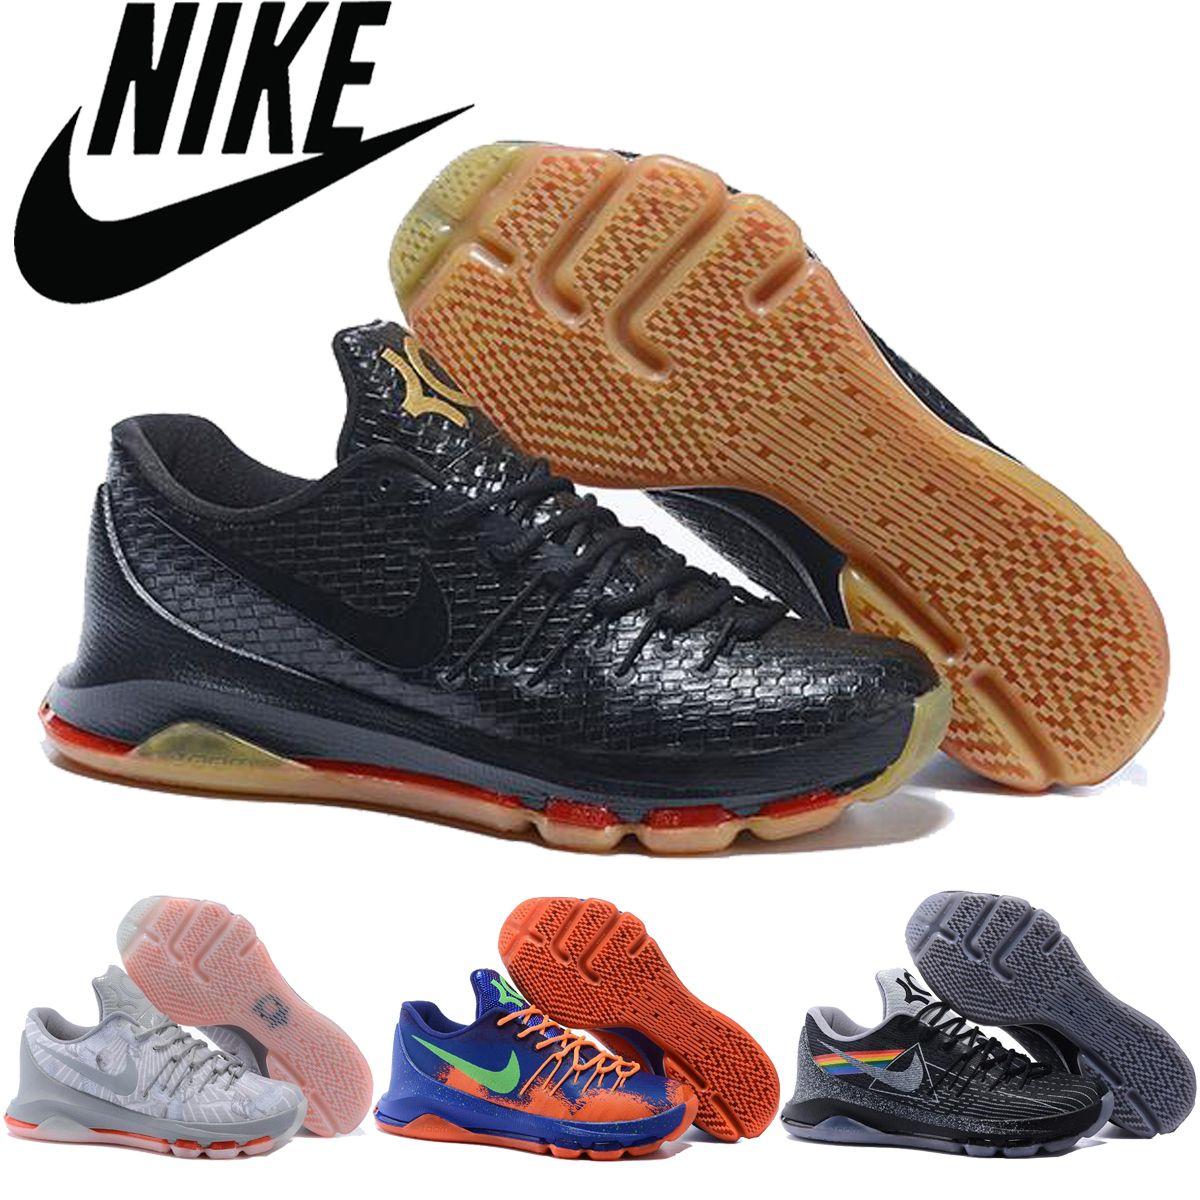 1dac653c339 Nike Kevin Durant Kd 8 Viii Nib Men S Basketball Shoes